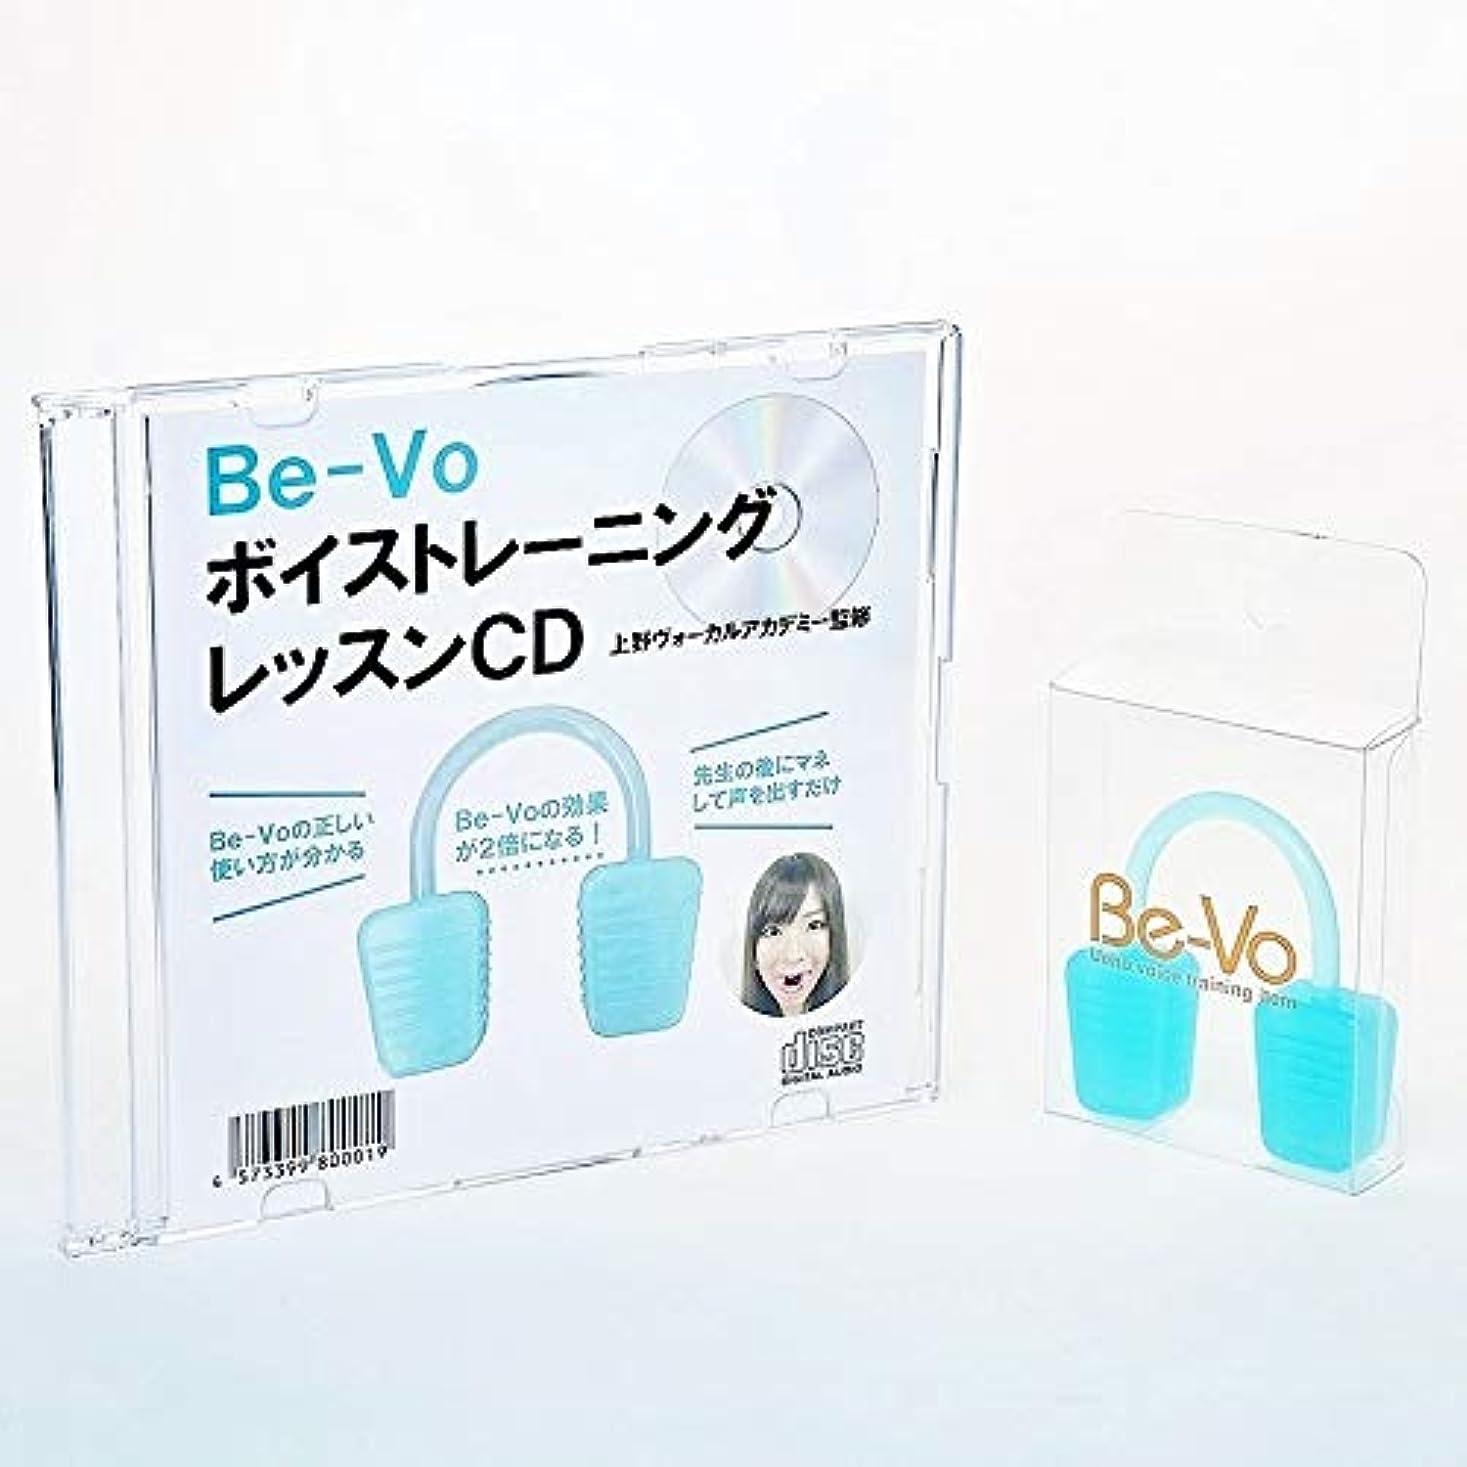 Be-Vo CD セット ブルー ボイストレーニング器具Be-Vo(ビーボ)+Be-VoボイストレーニングレッスンCD2点セット